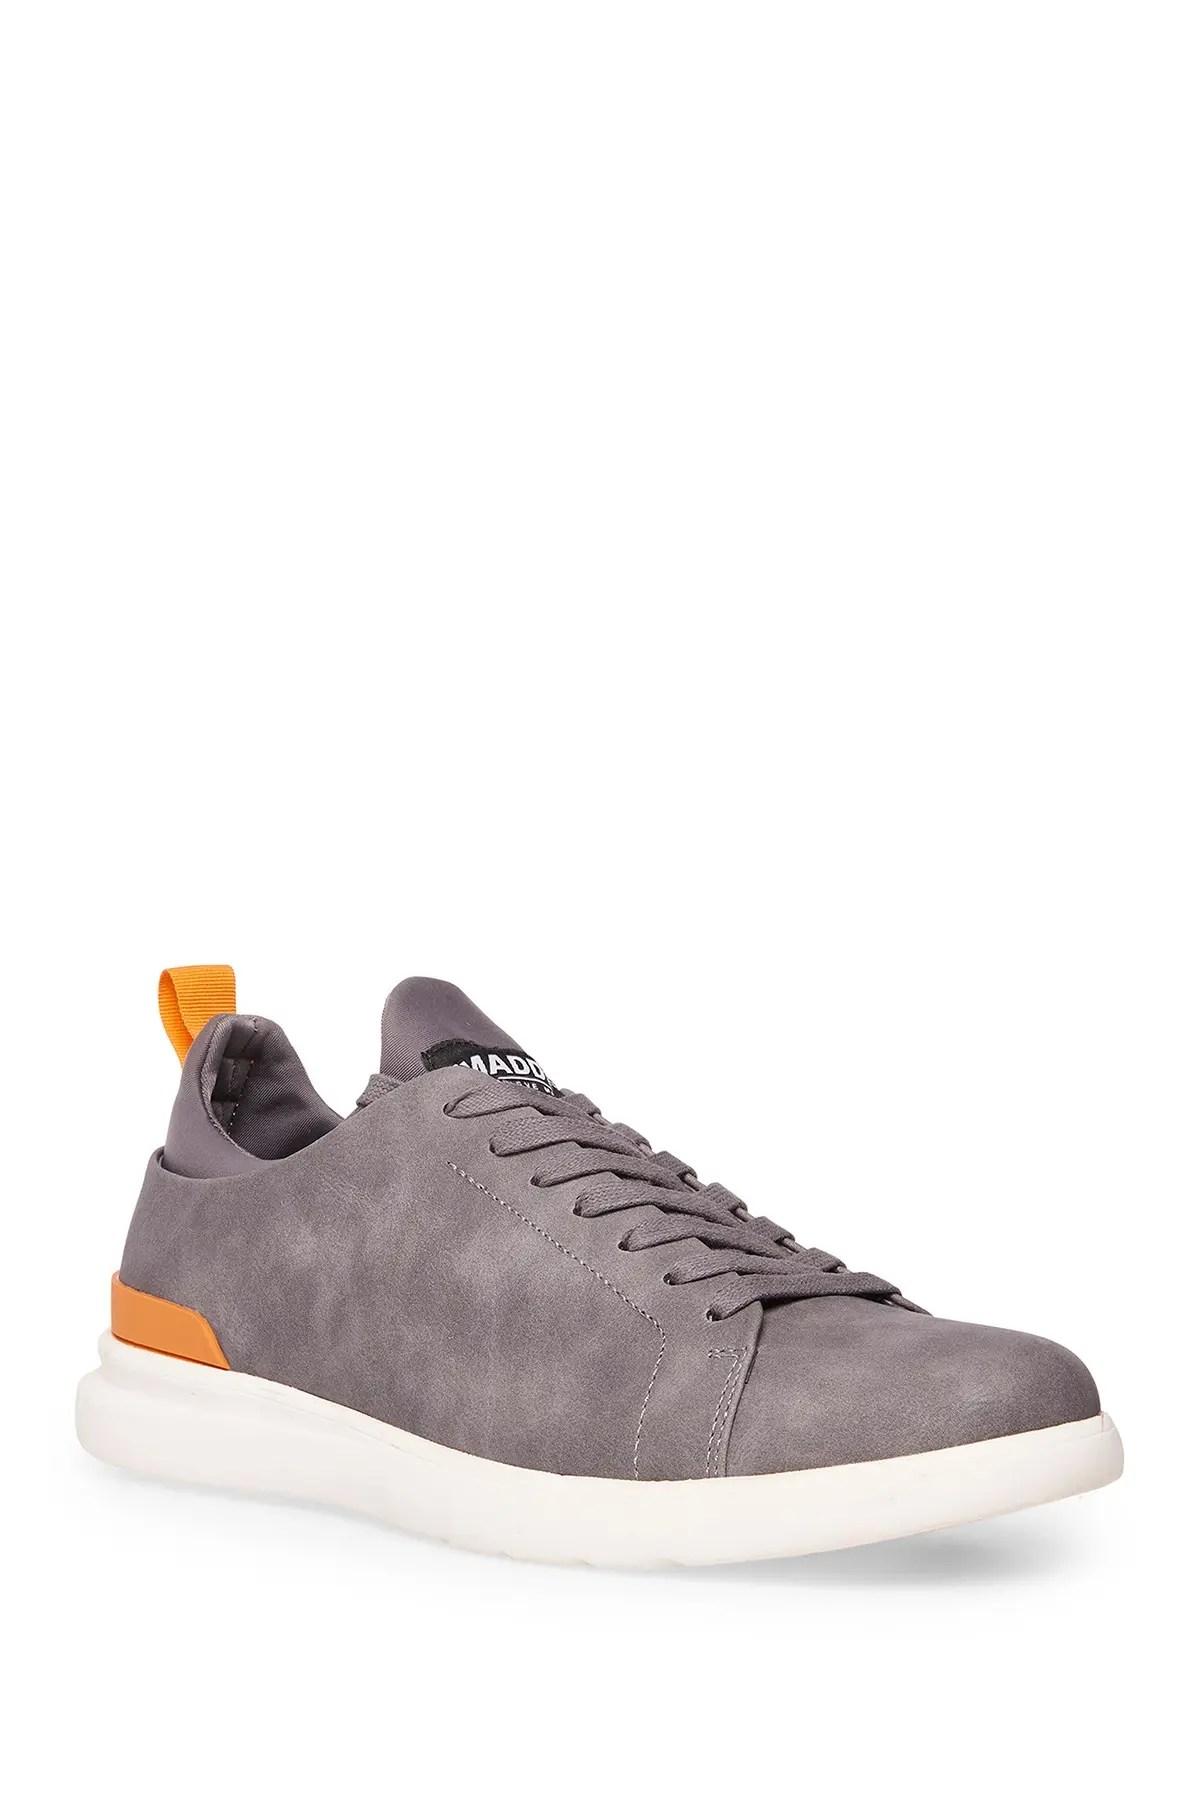 sneakers for men clearance nordstrom rack